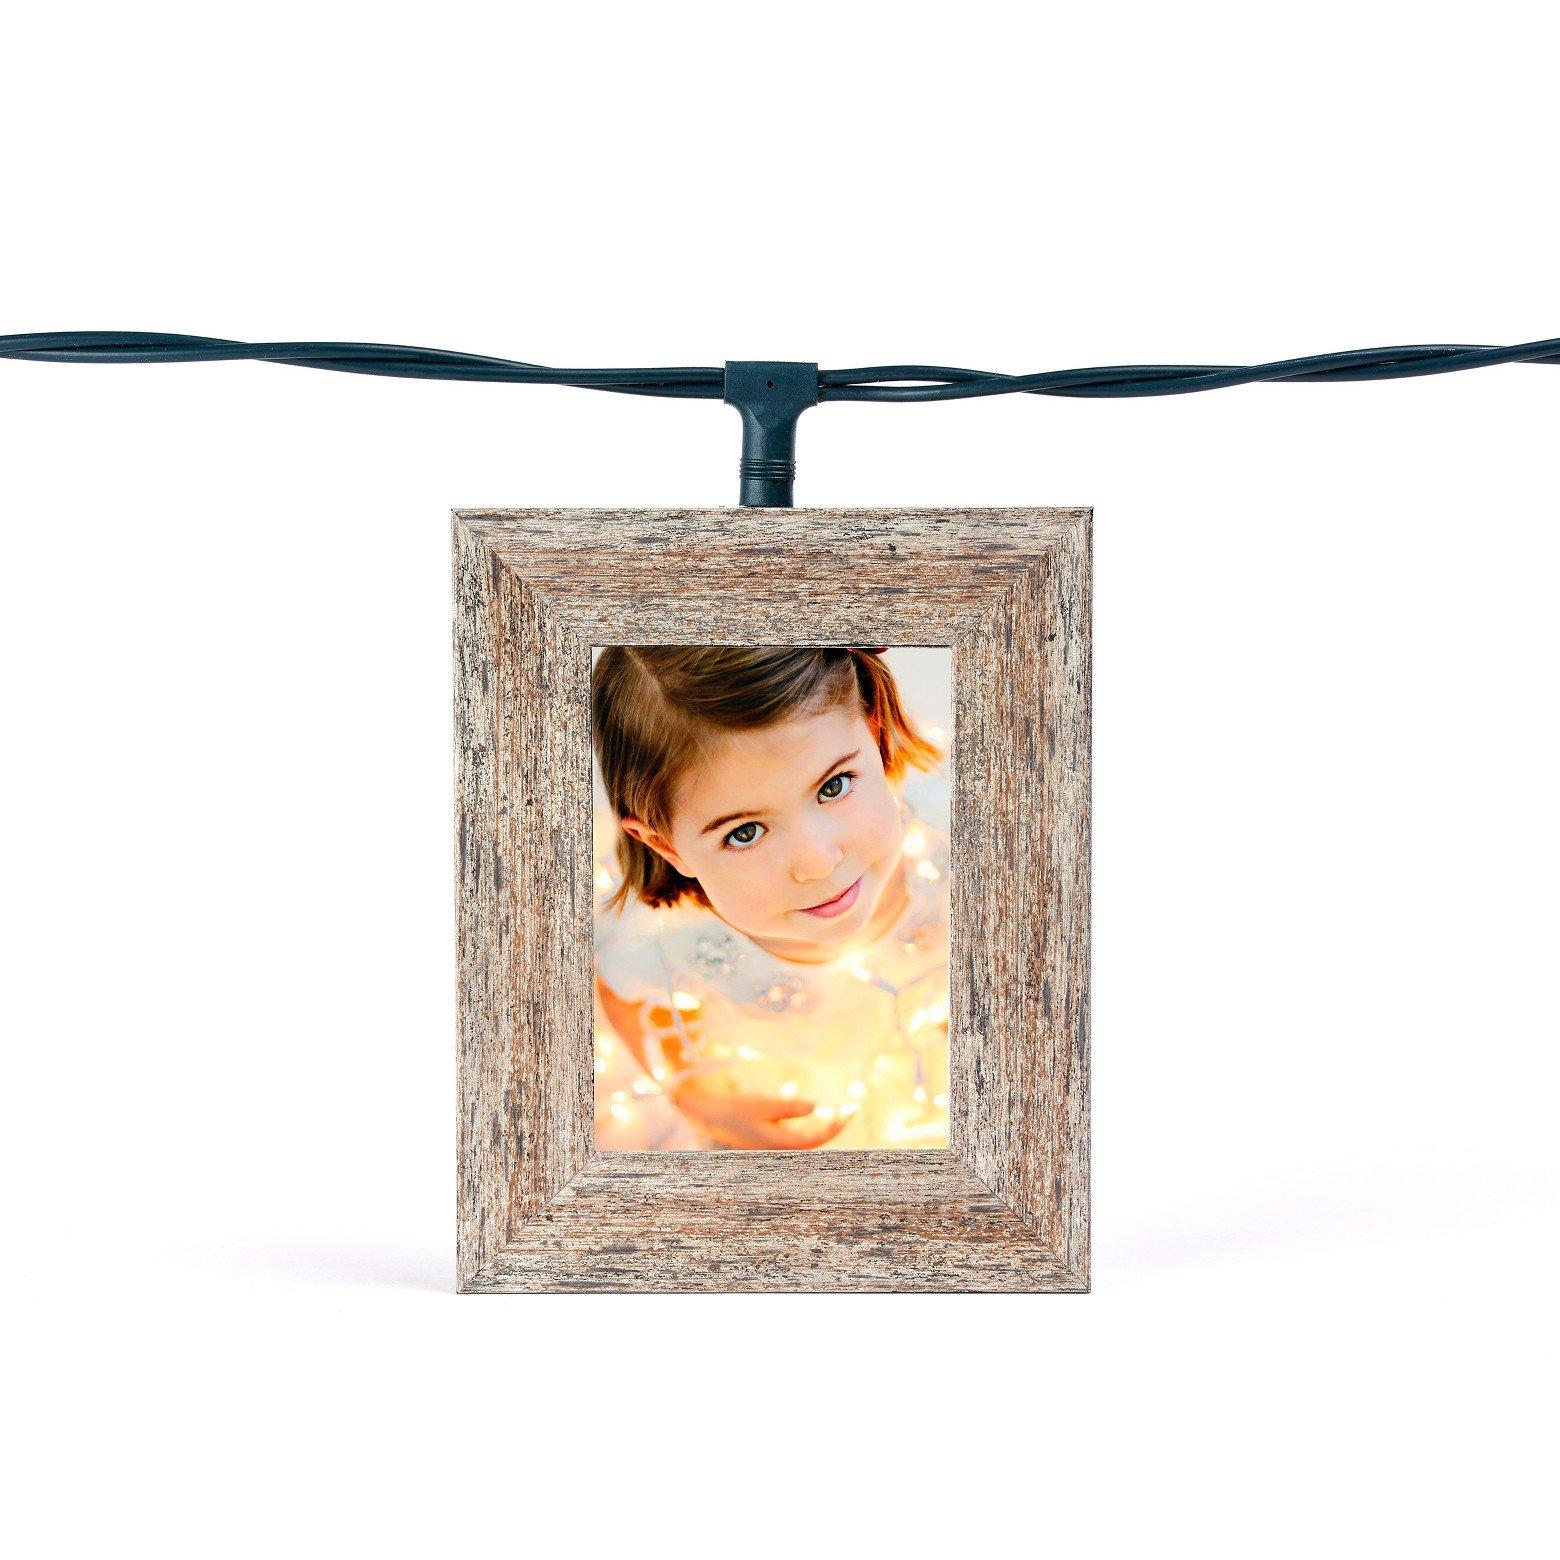 Polaroid 5 Photo Frame Lightboxes - Distressed Gray Wood Frame